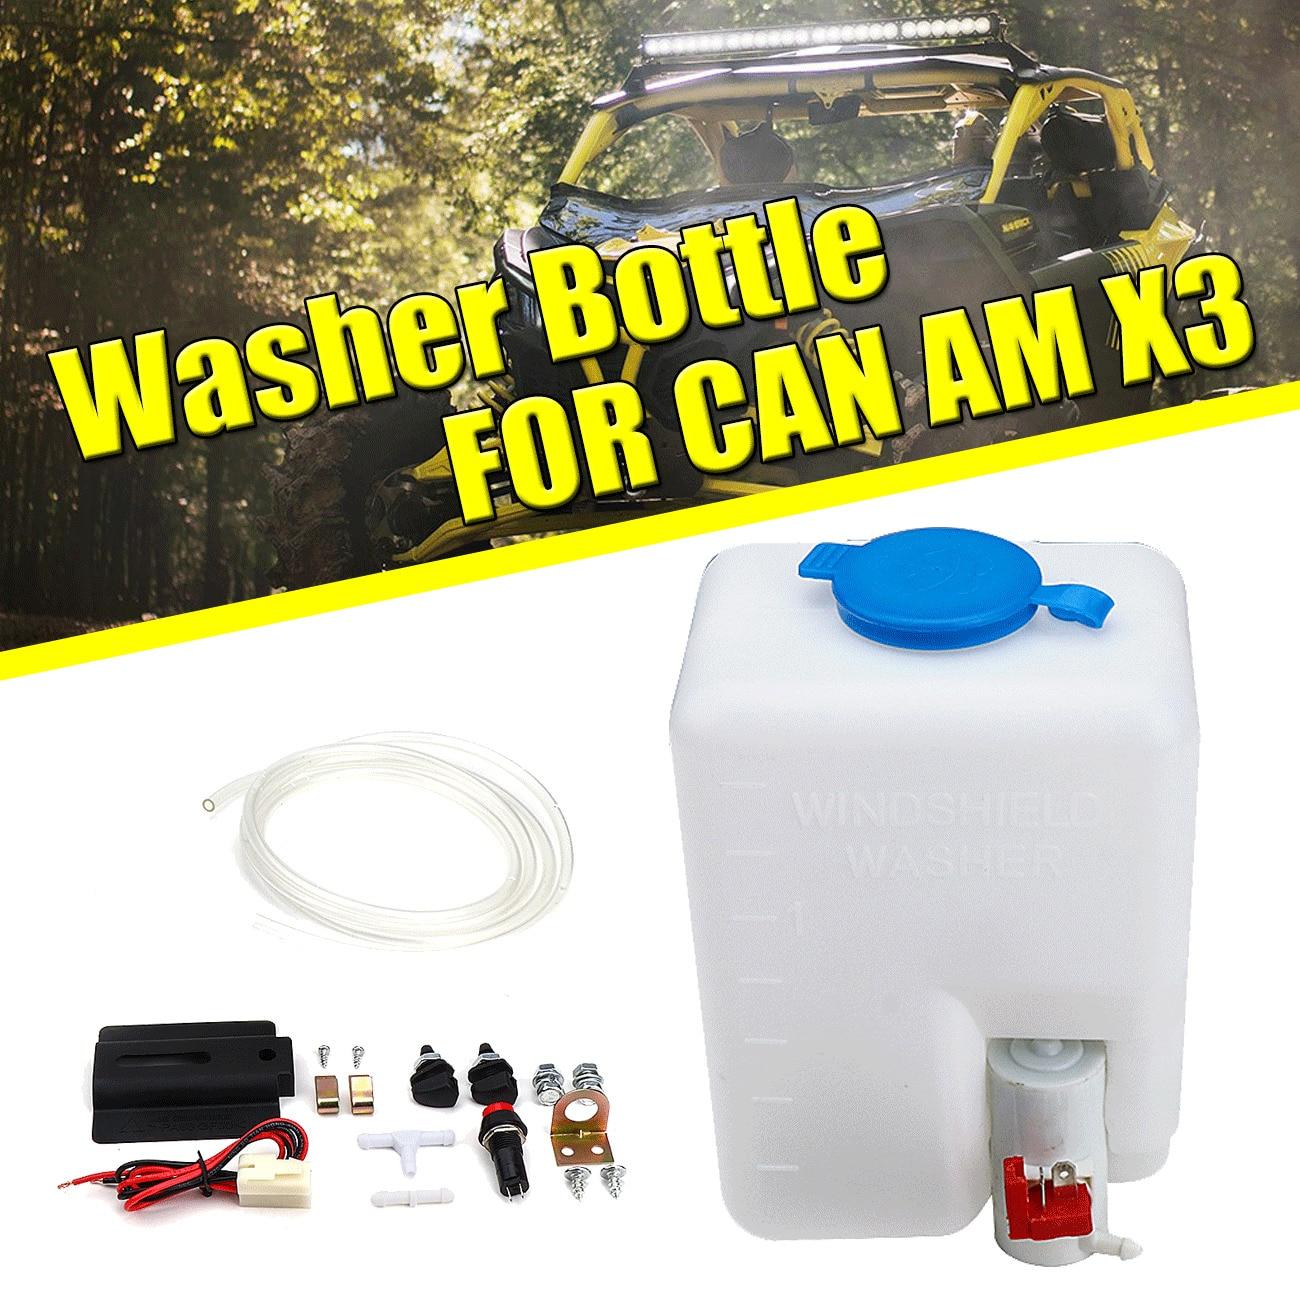 12V UTV Windshield Washer Bottle Tank Pump Wiper Kit Universal For Can Am Maverick X3 MAX R Turbo 4X4 2017-2019 2018